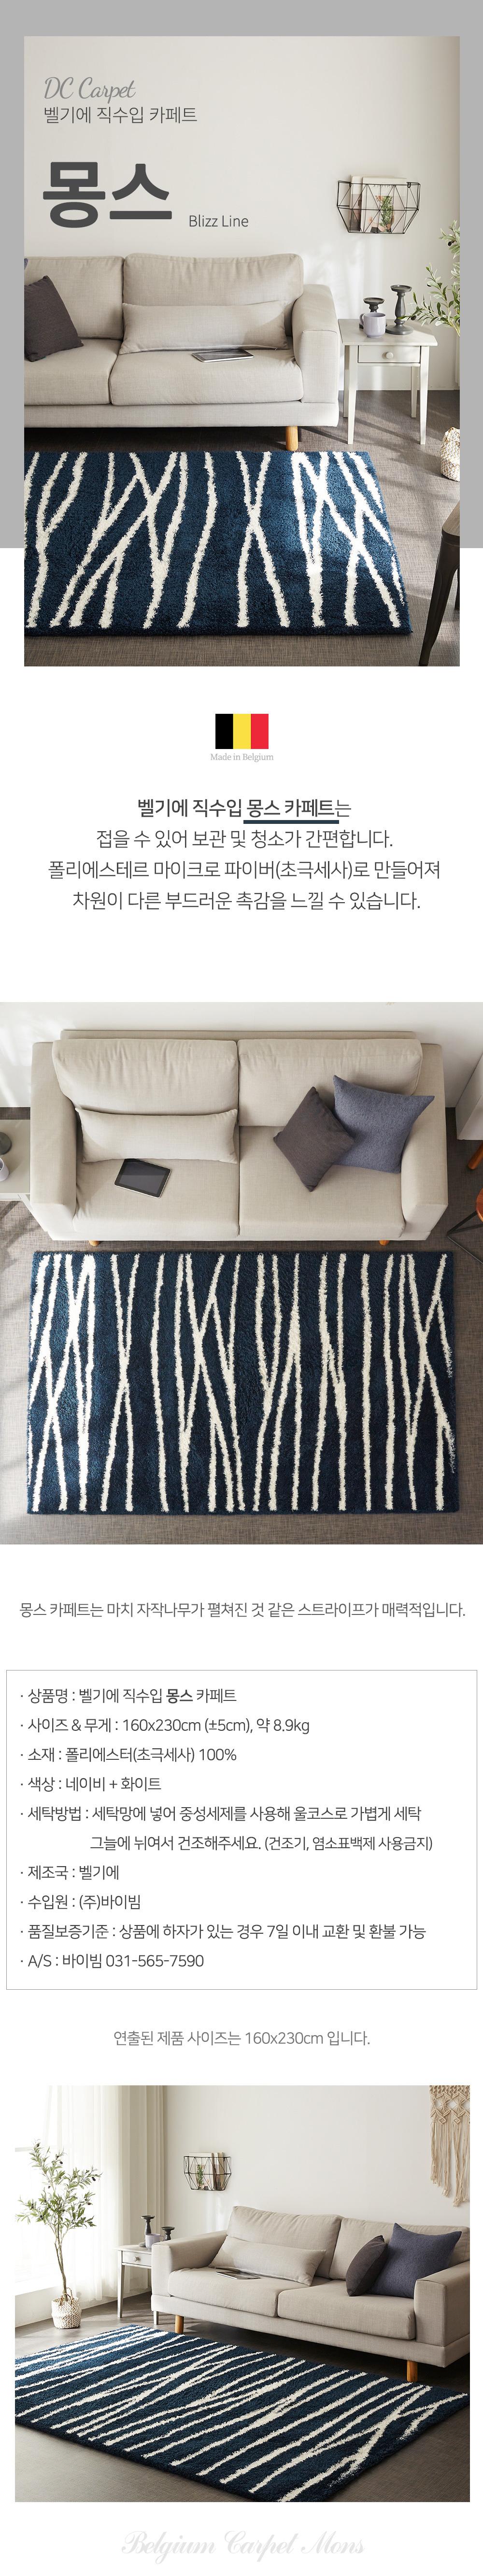 Belgium DC Carpet - washable rug - mons